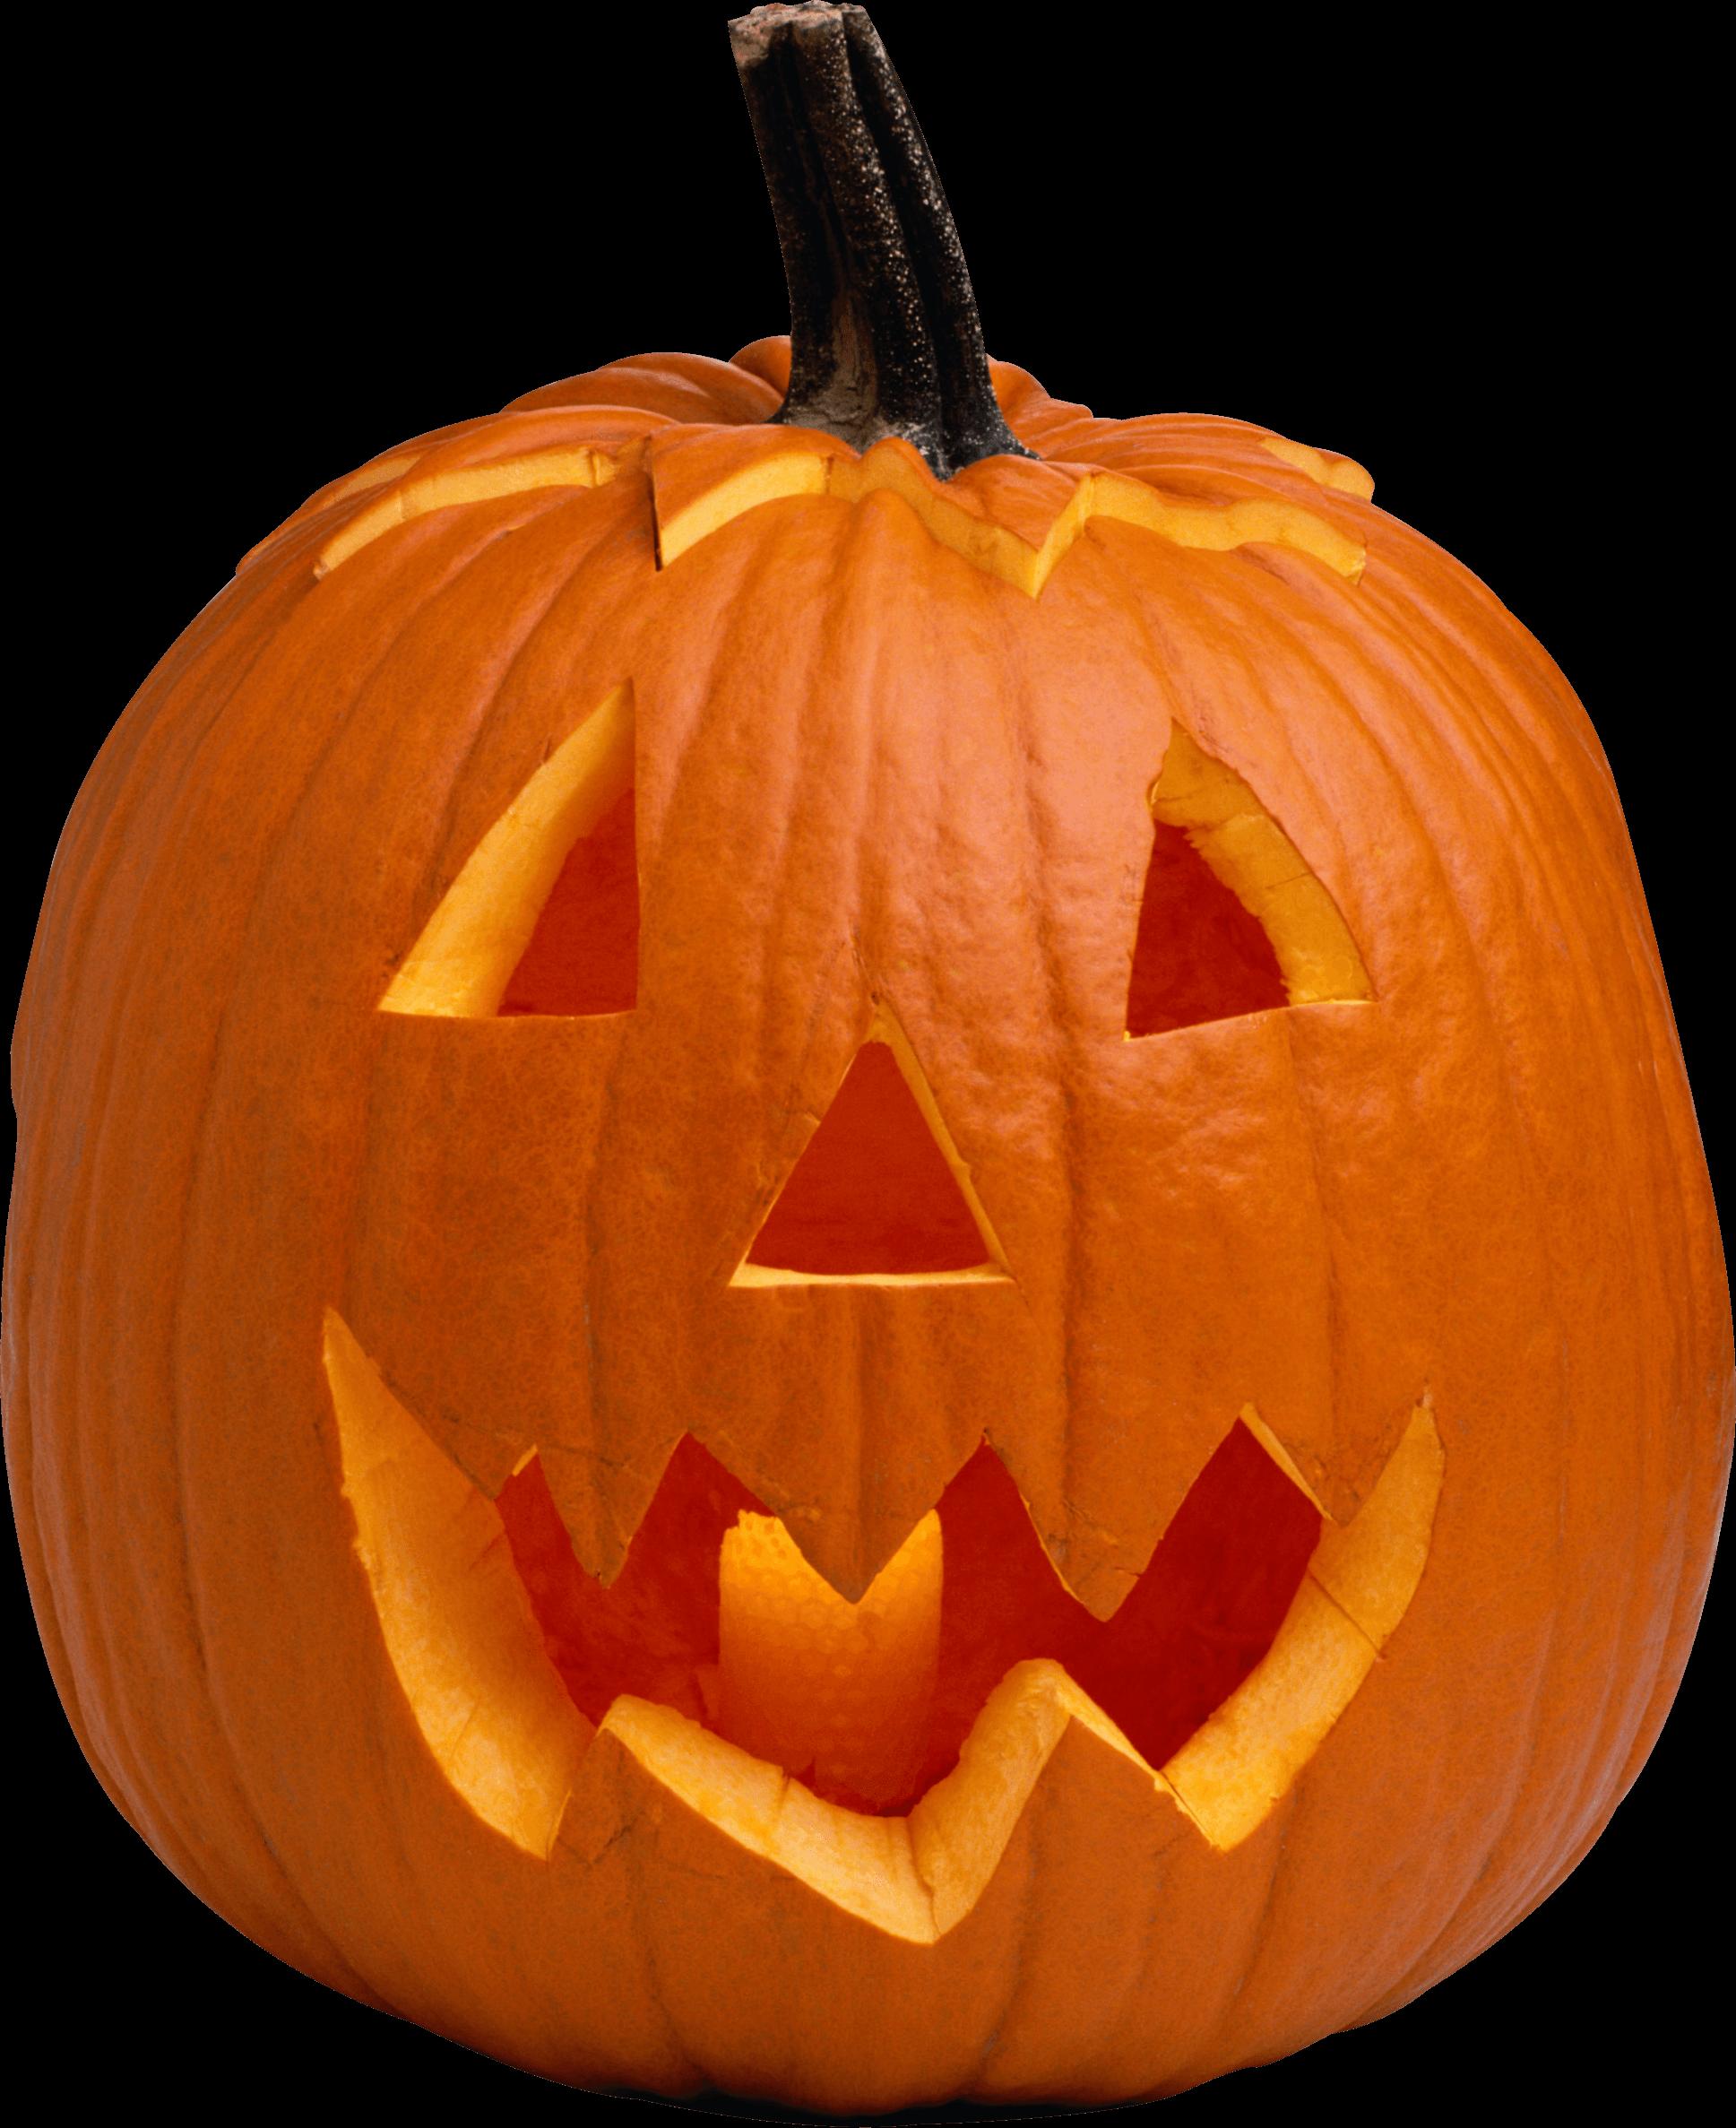 Pumpkin clipart .png clip freeuse stock Candle Halloween Pumpkin transparent PNG - StickPNG clip freeuse stock